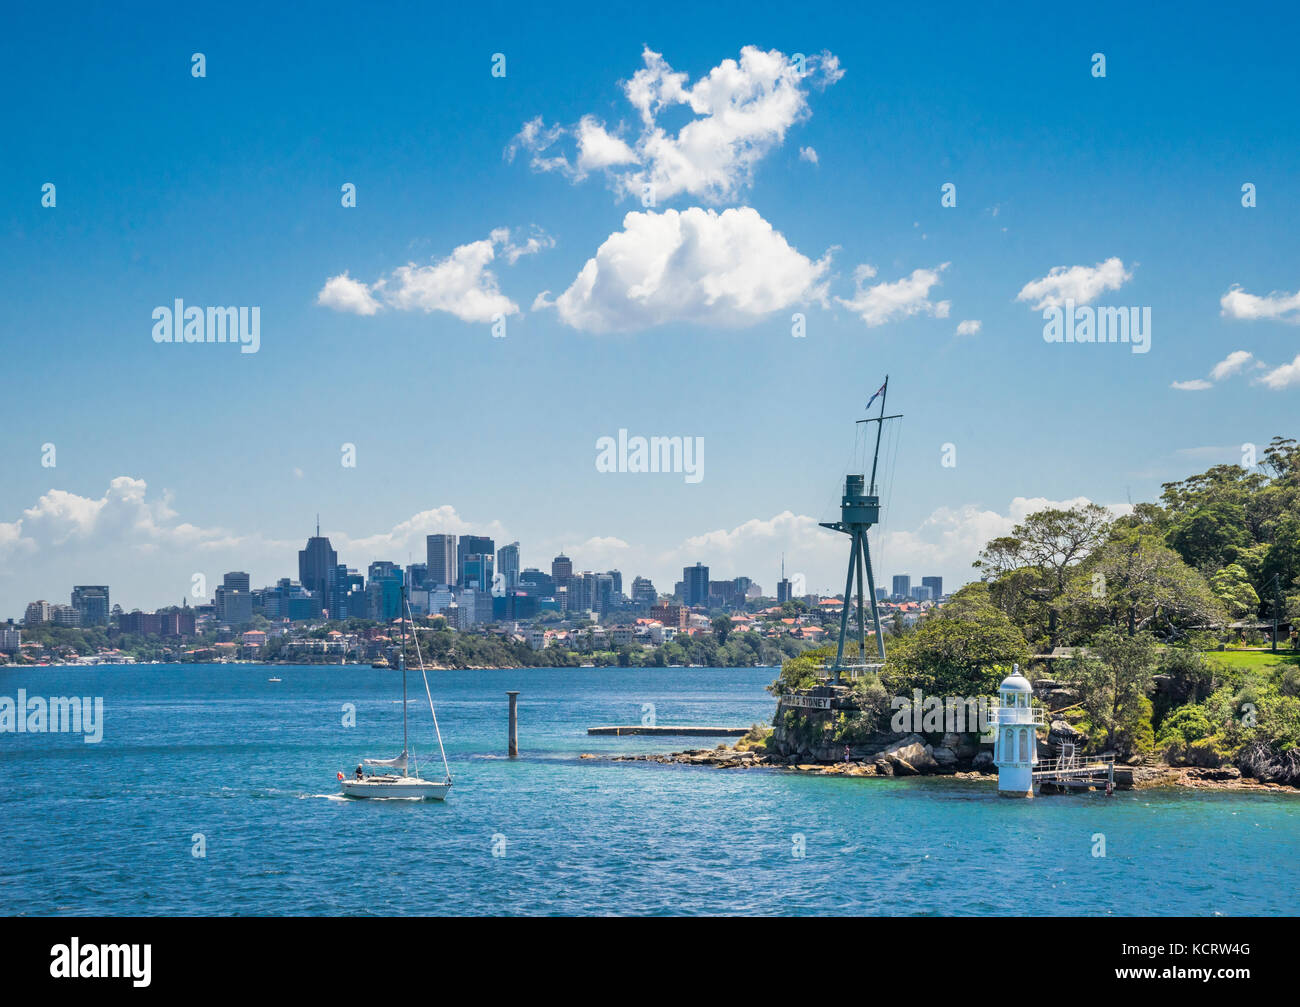 Australia, New South Wales, Sydney Harbour, Port Jackson, view of the Sydney skyline from Bradleys Head with HMS - Stock Image